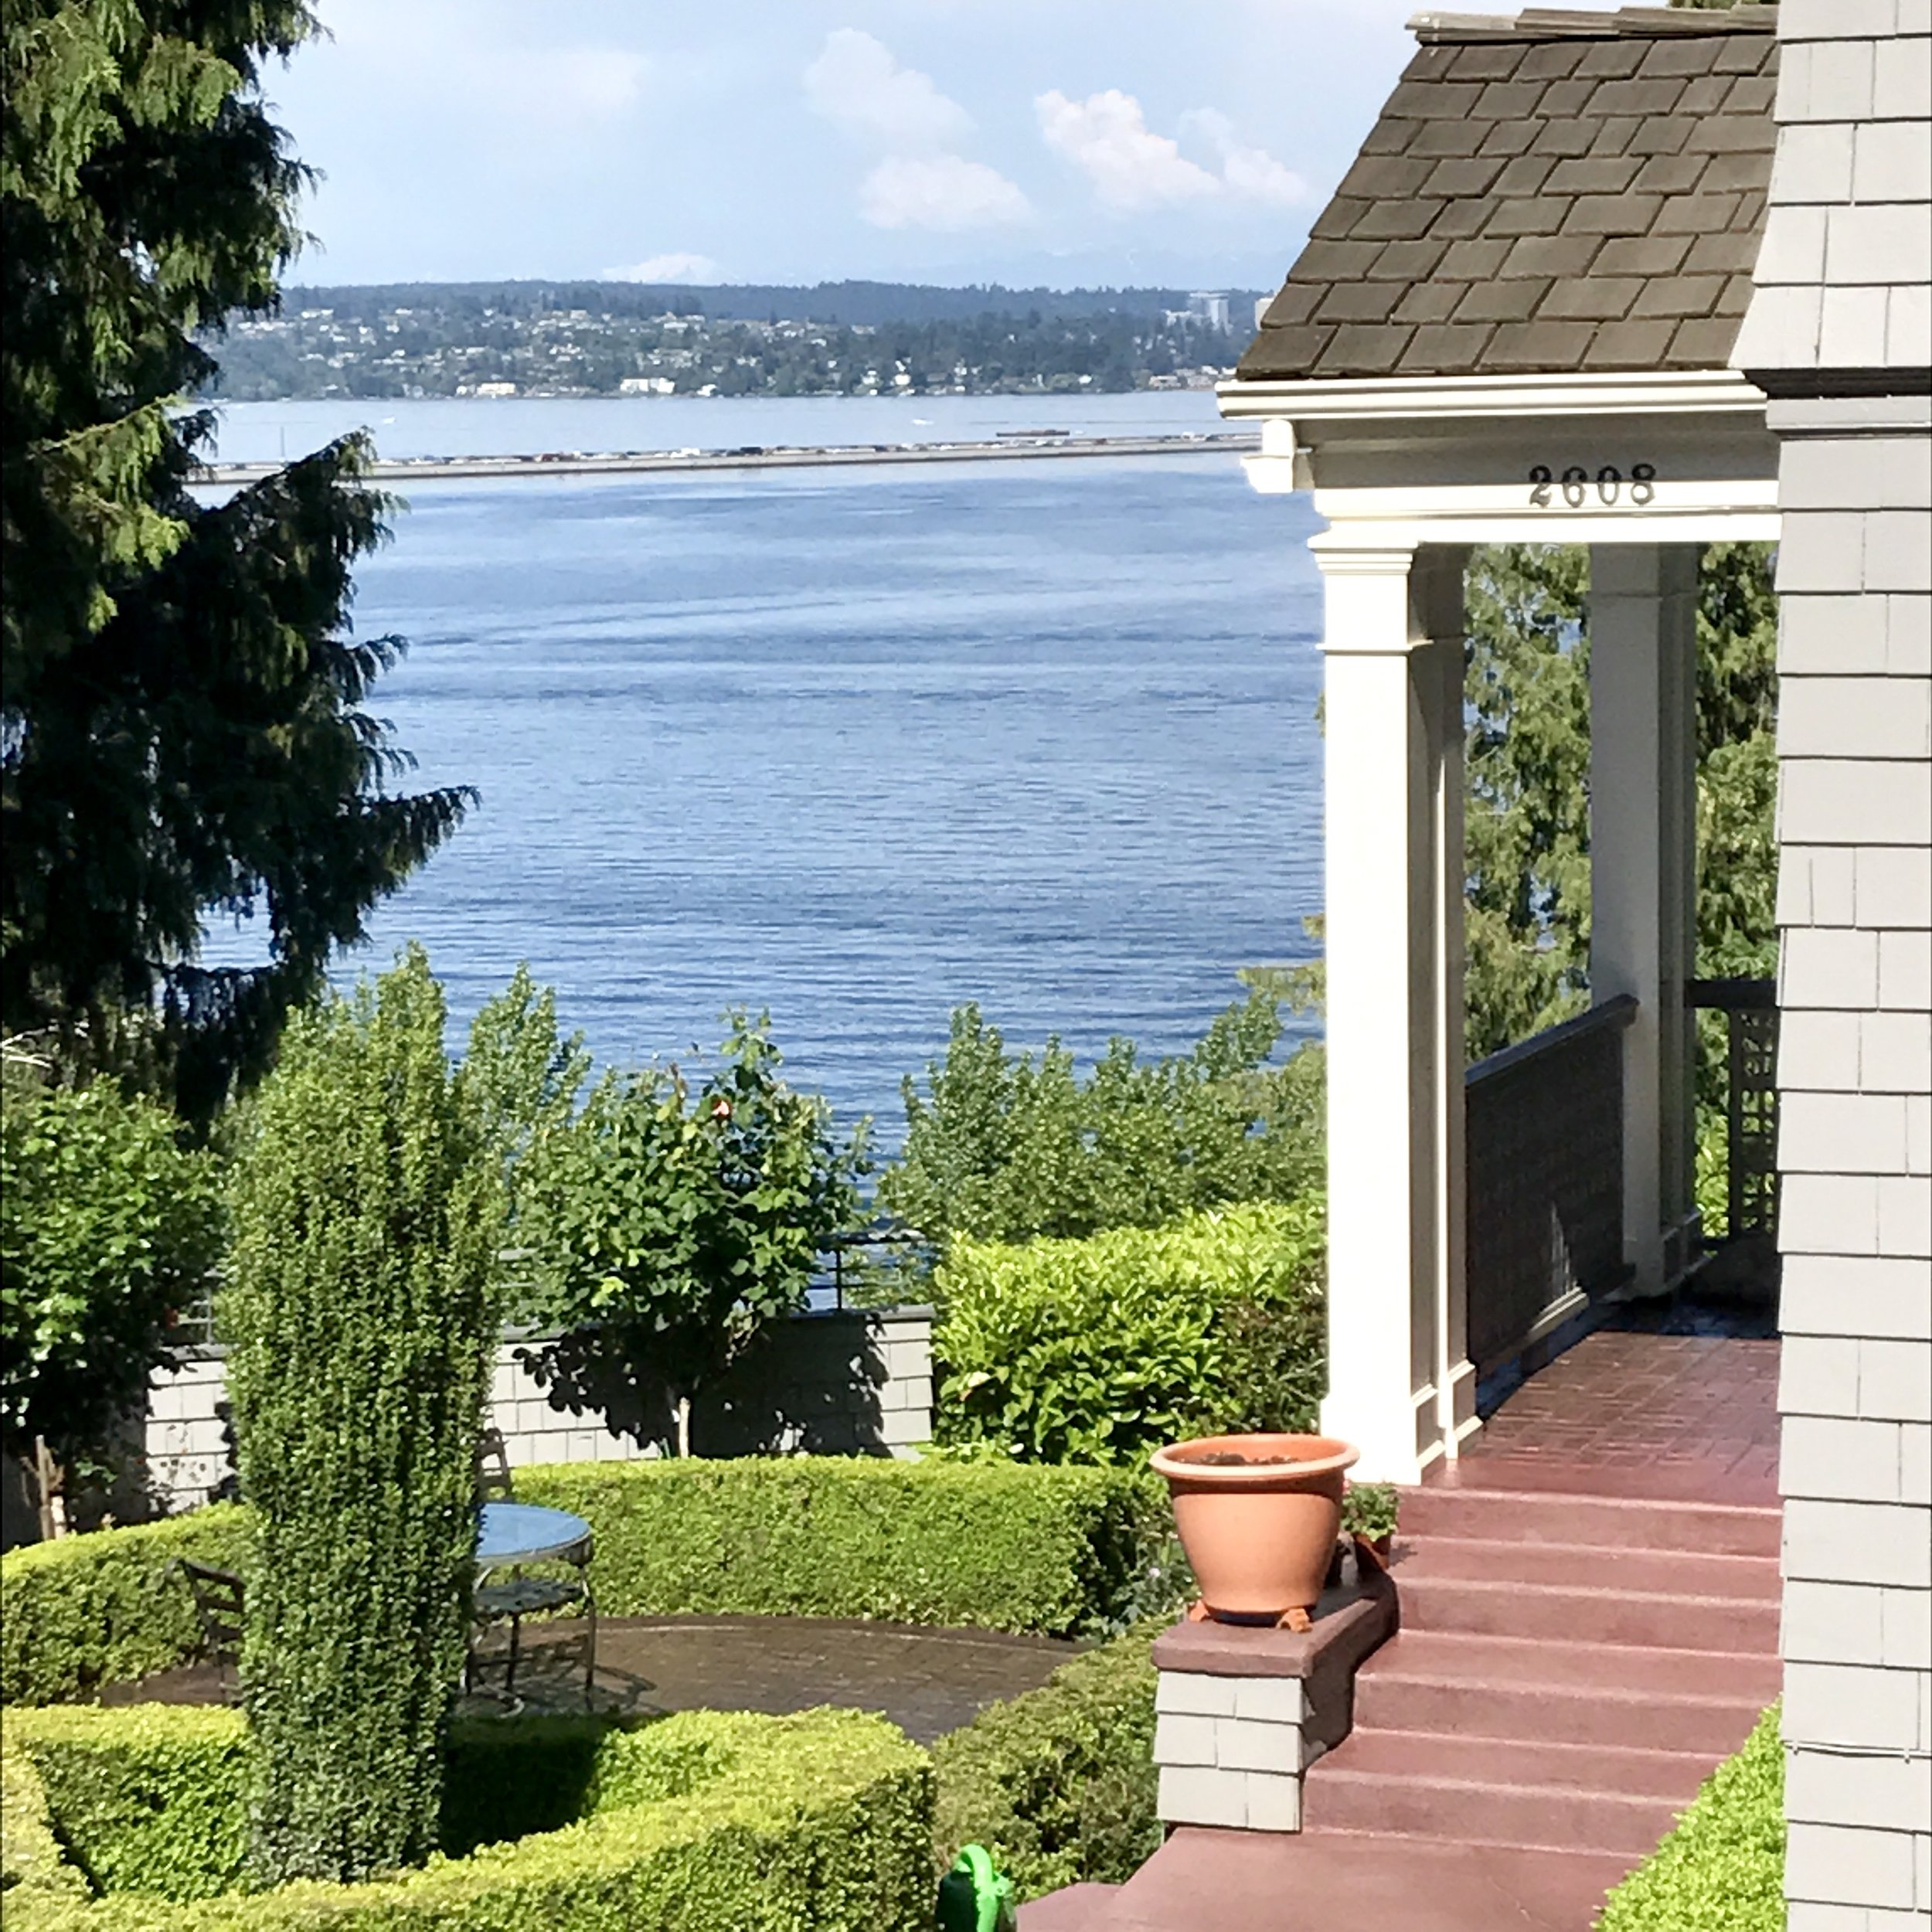 House - lake view.jpg